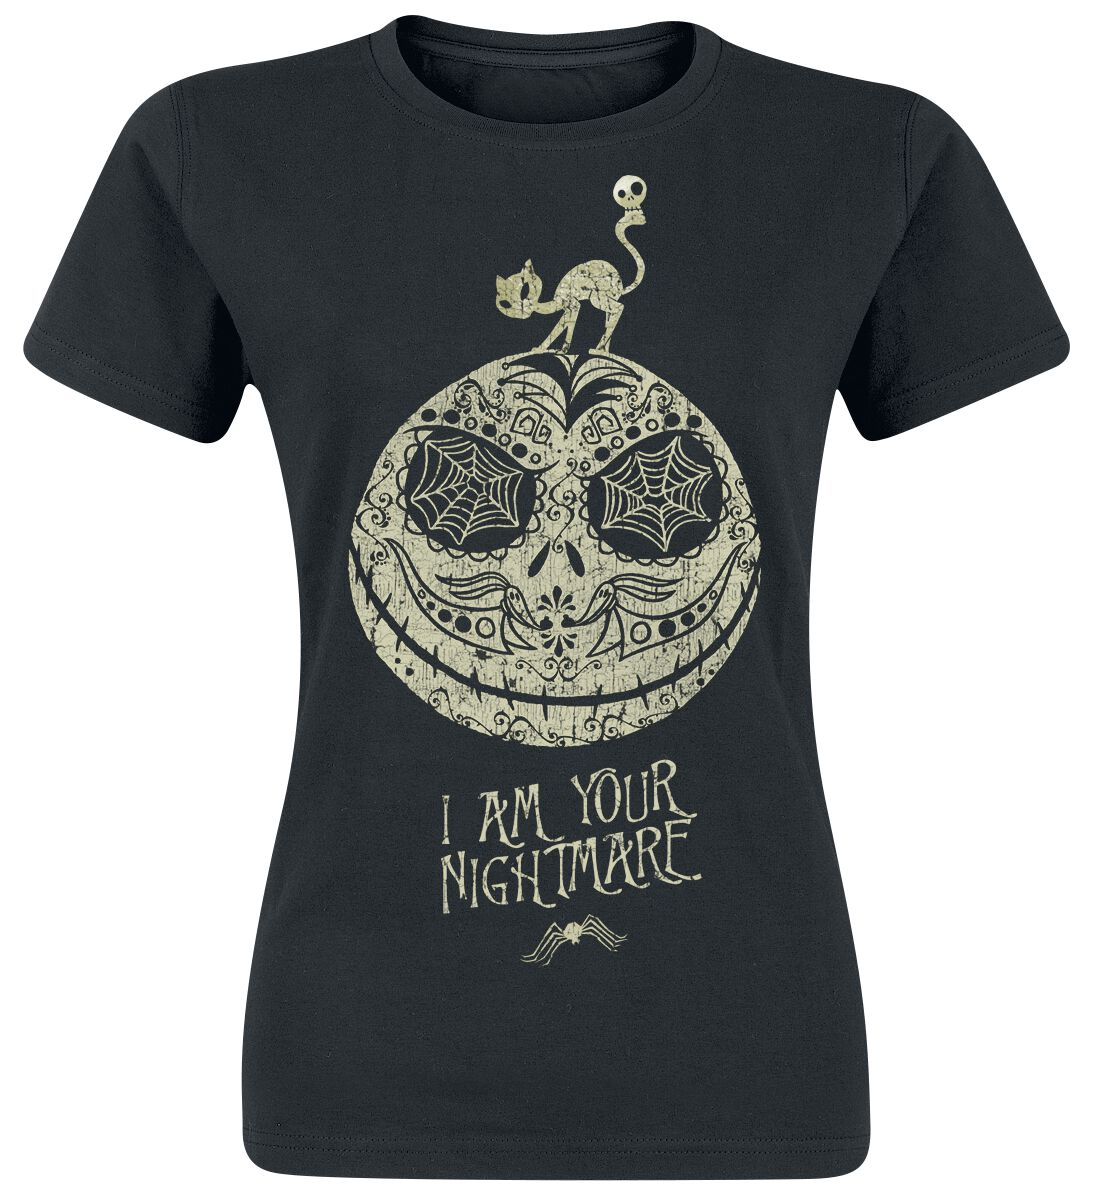 Image of   The Nightmare Before Christmas Jack - I Am Your Nightmare Girlie trøje sort